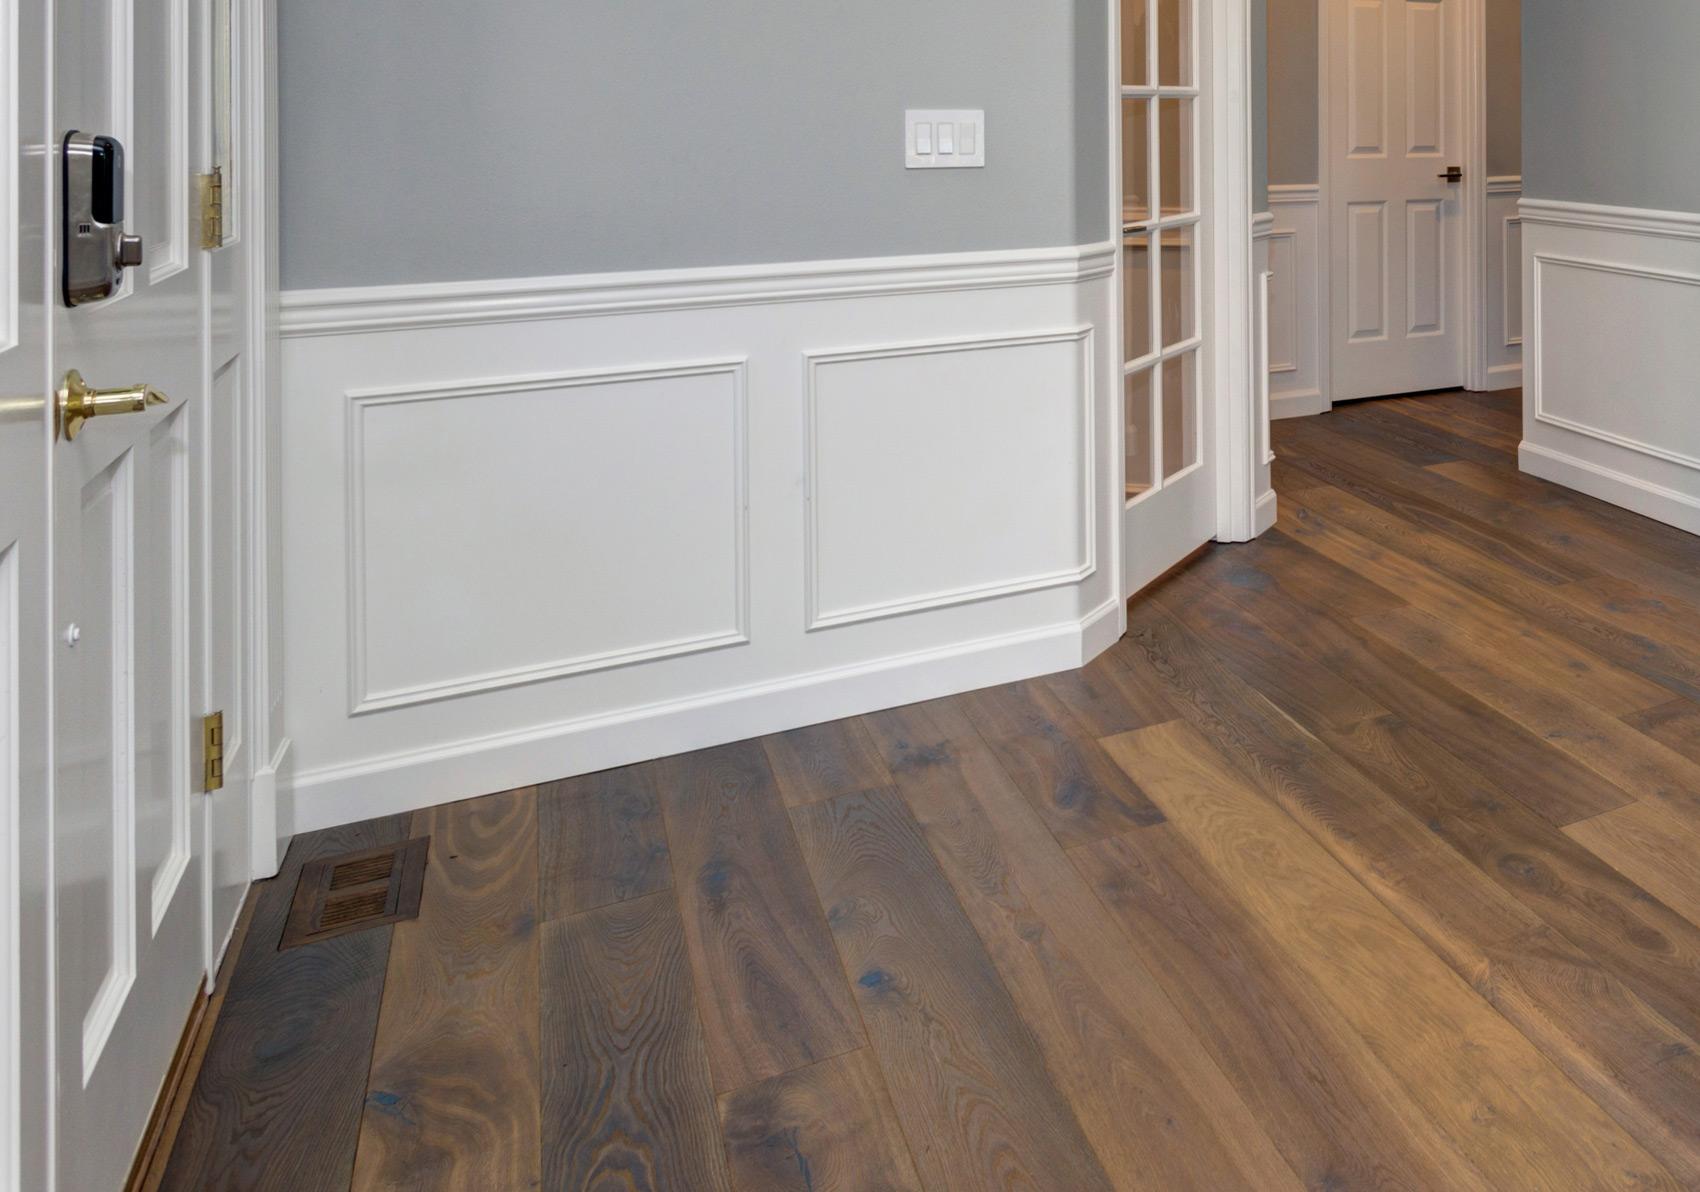 Molding And Trim Benchmark Wood Floors